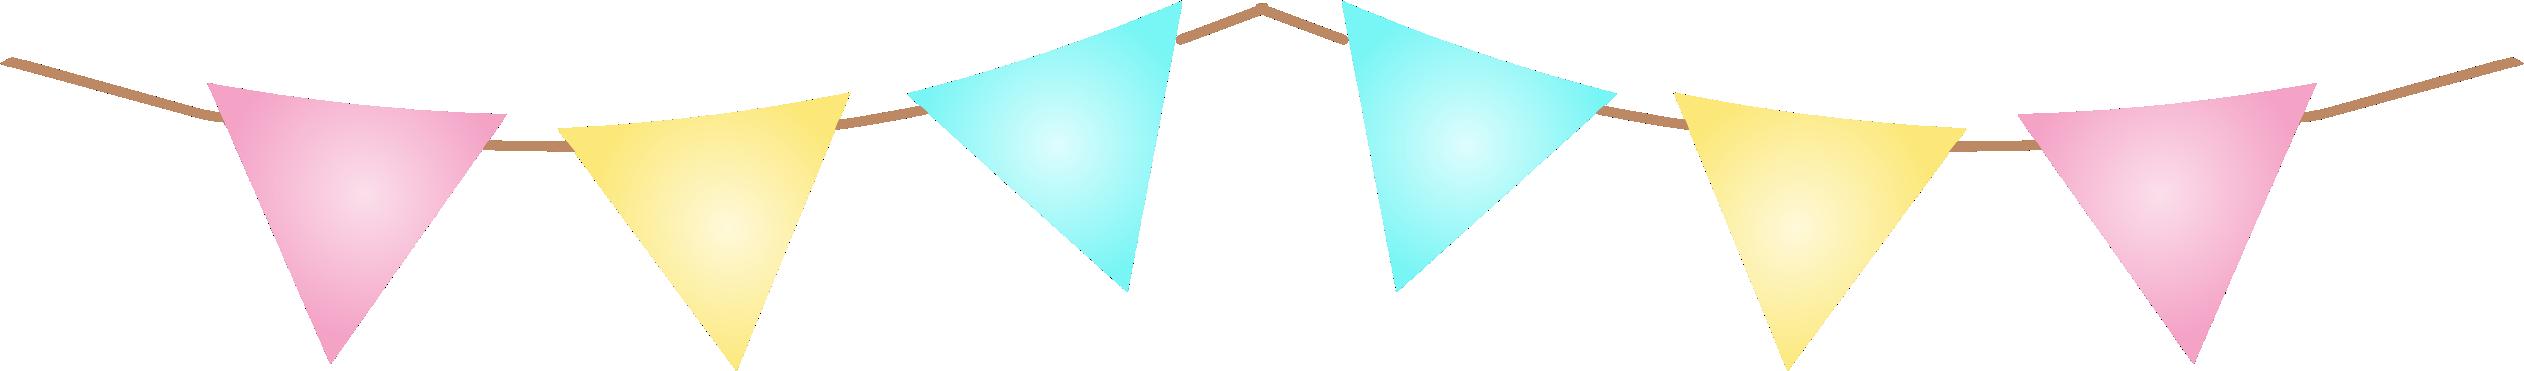 bandeirinha 1